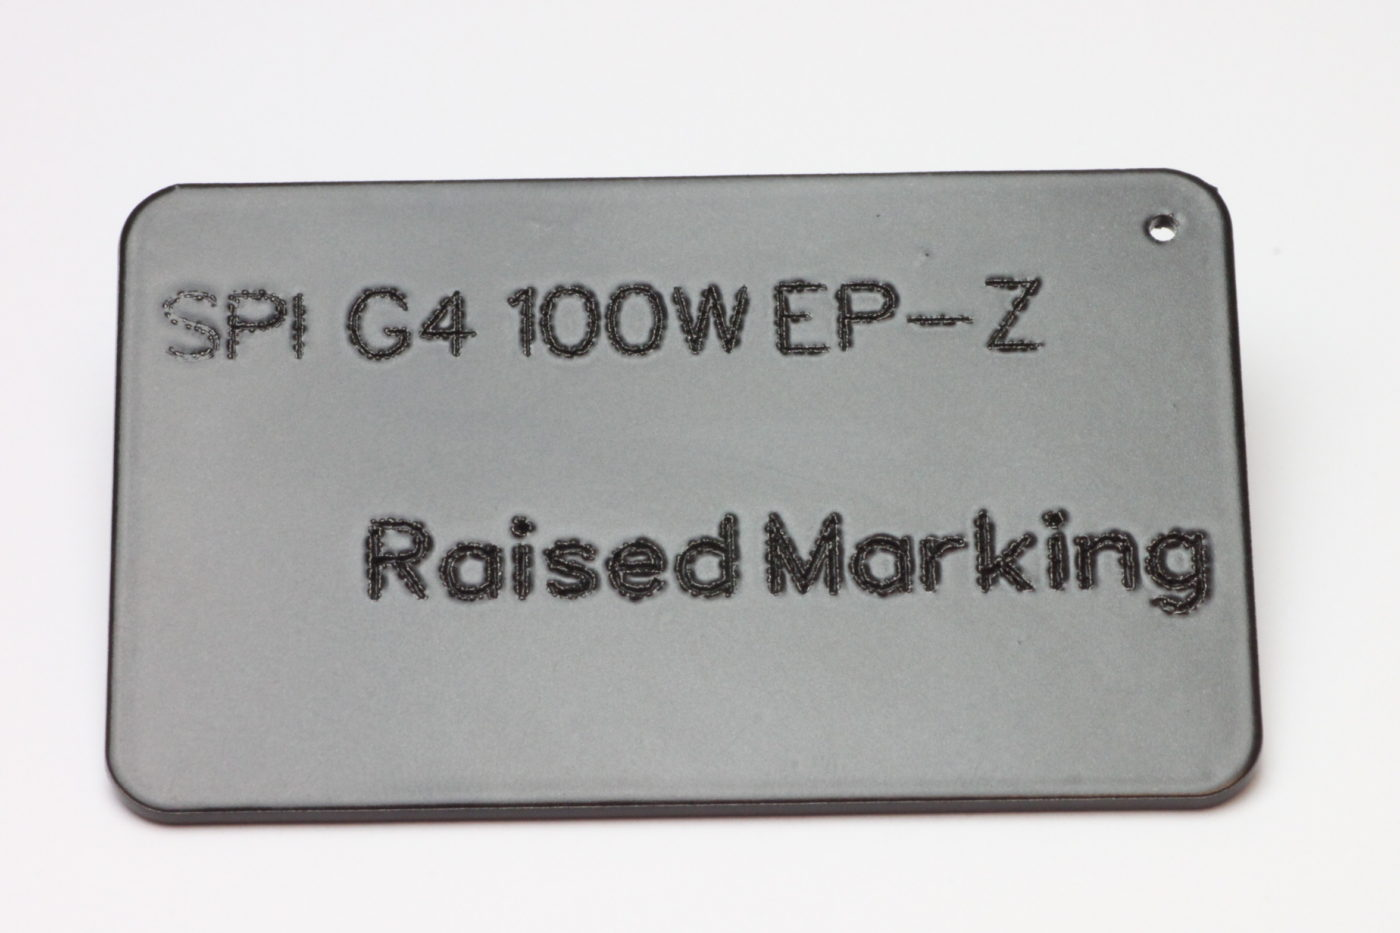 Raised Marking Laser application